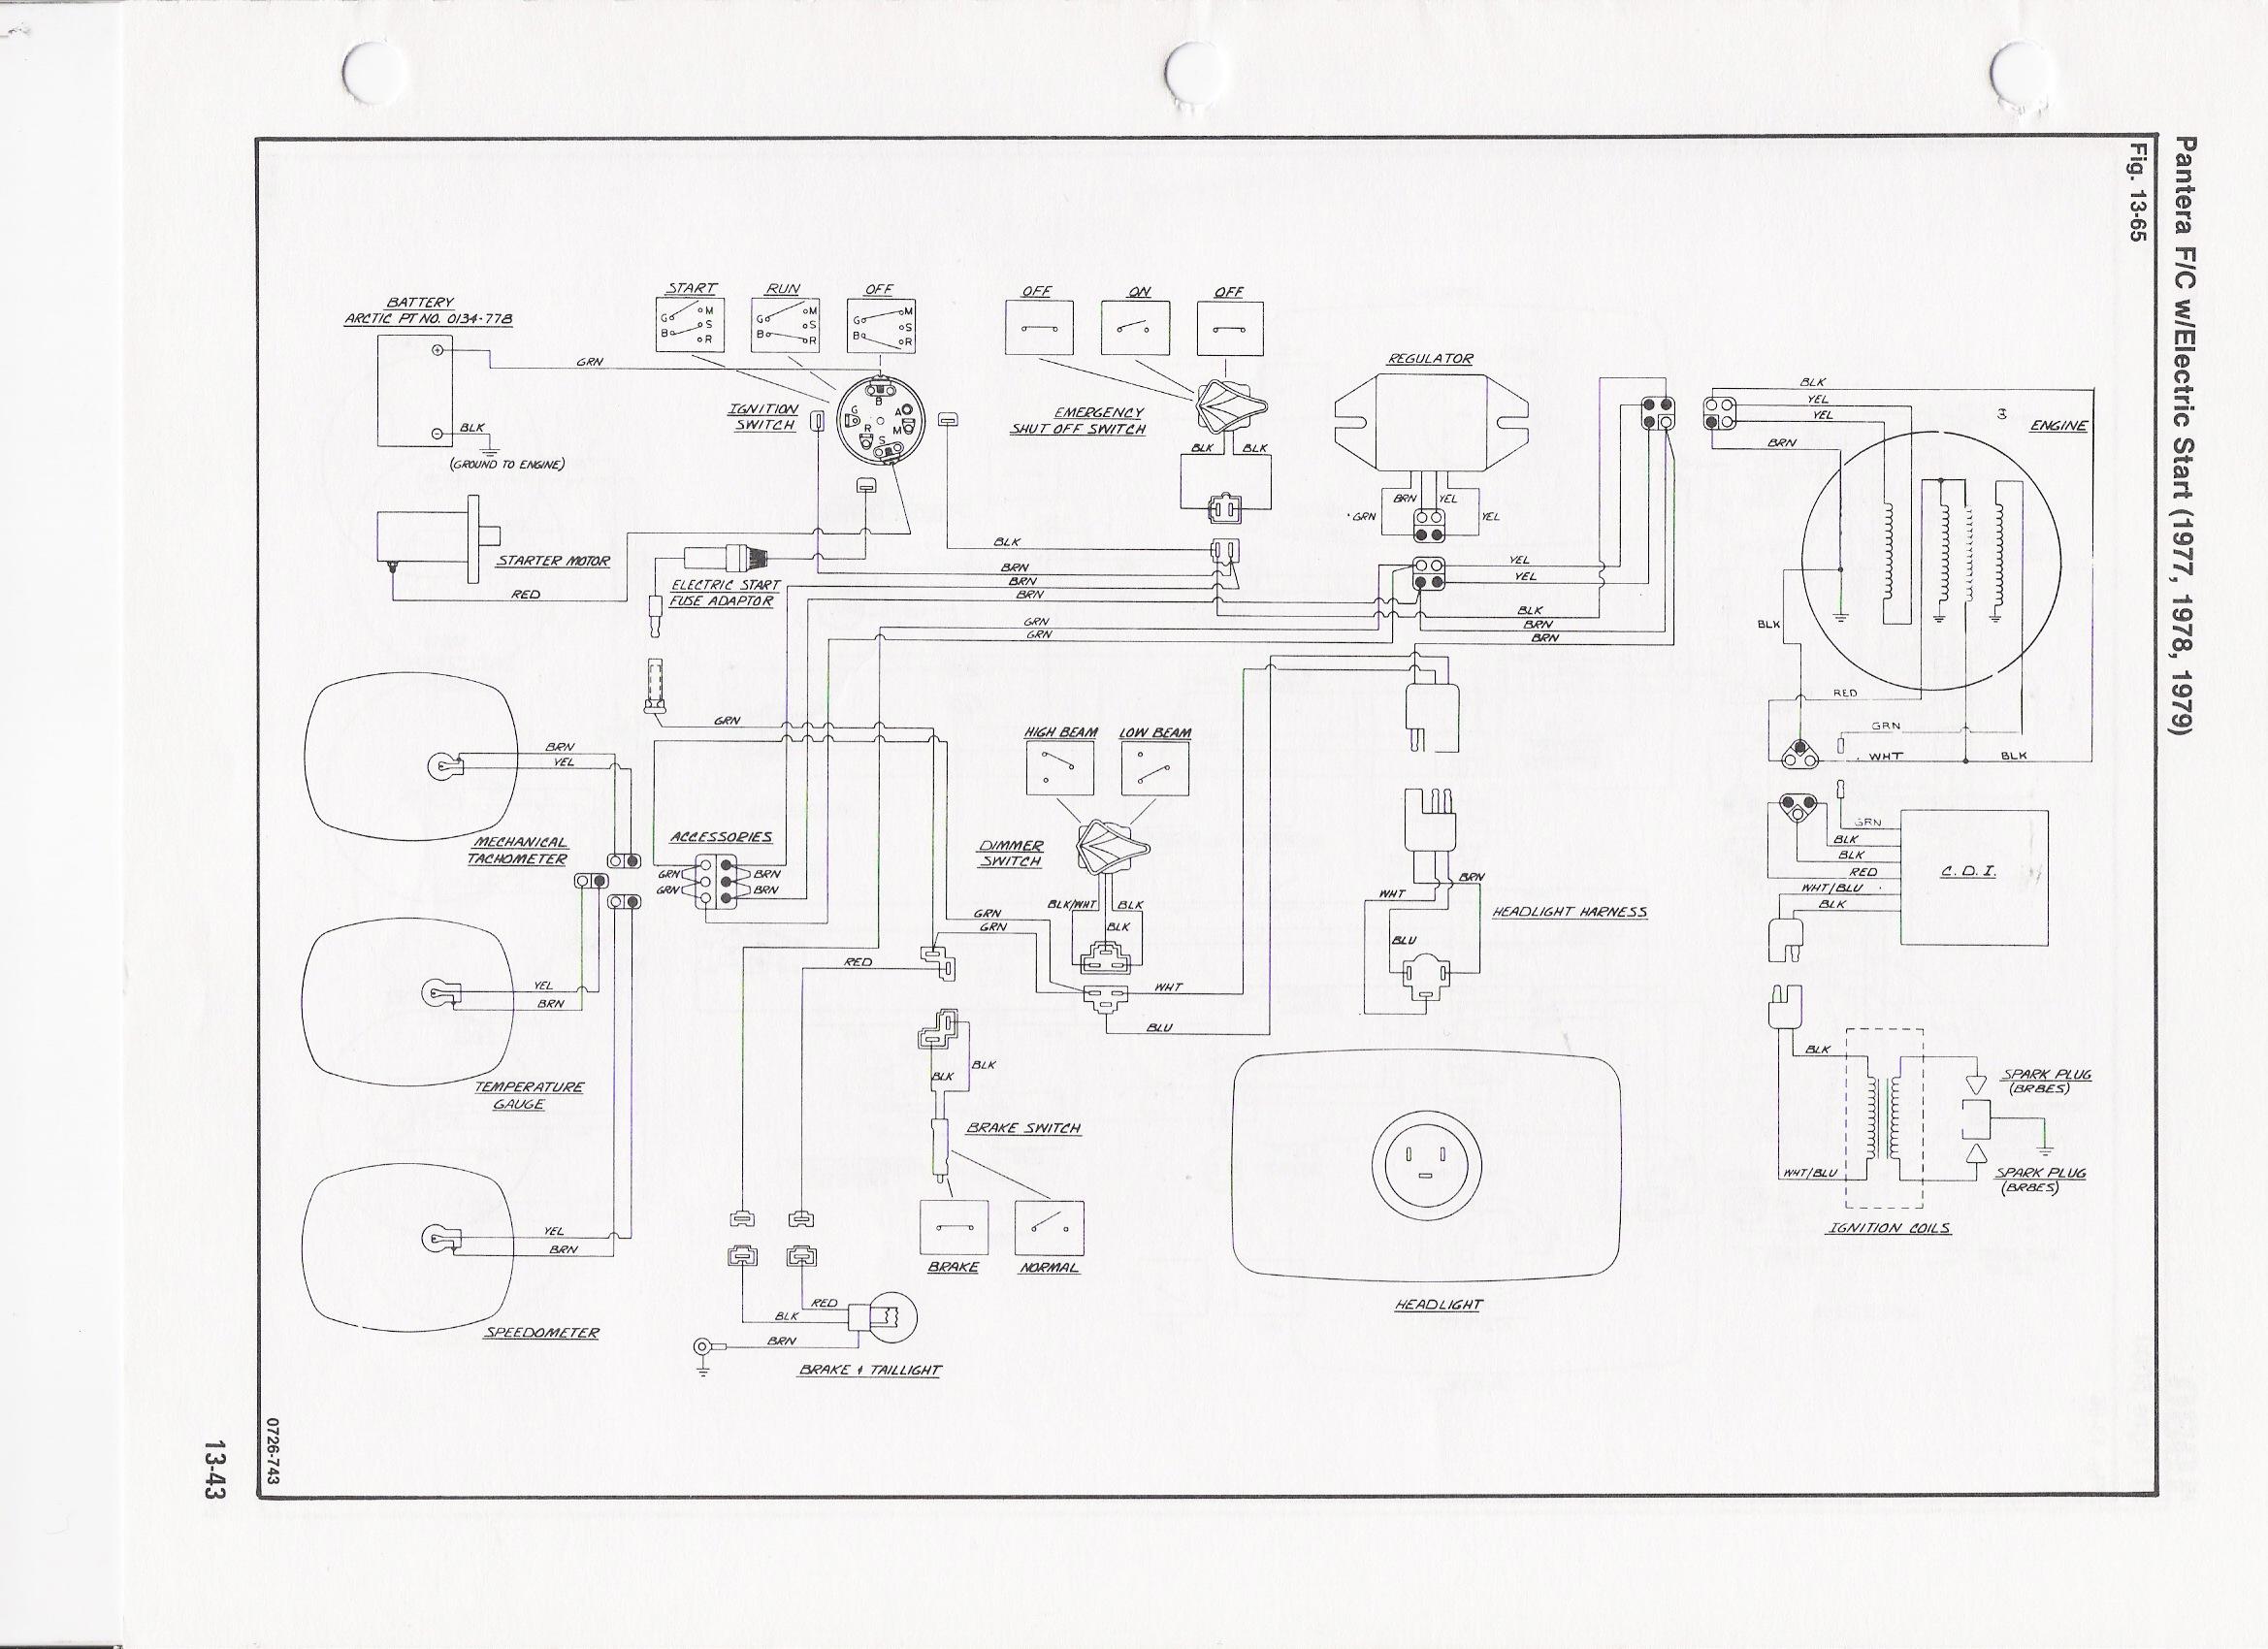 1991 arctic cat jag wiring diagram wiring diagram rh w1 reise ferienplan de